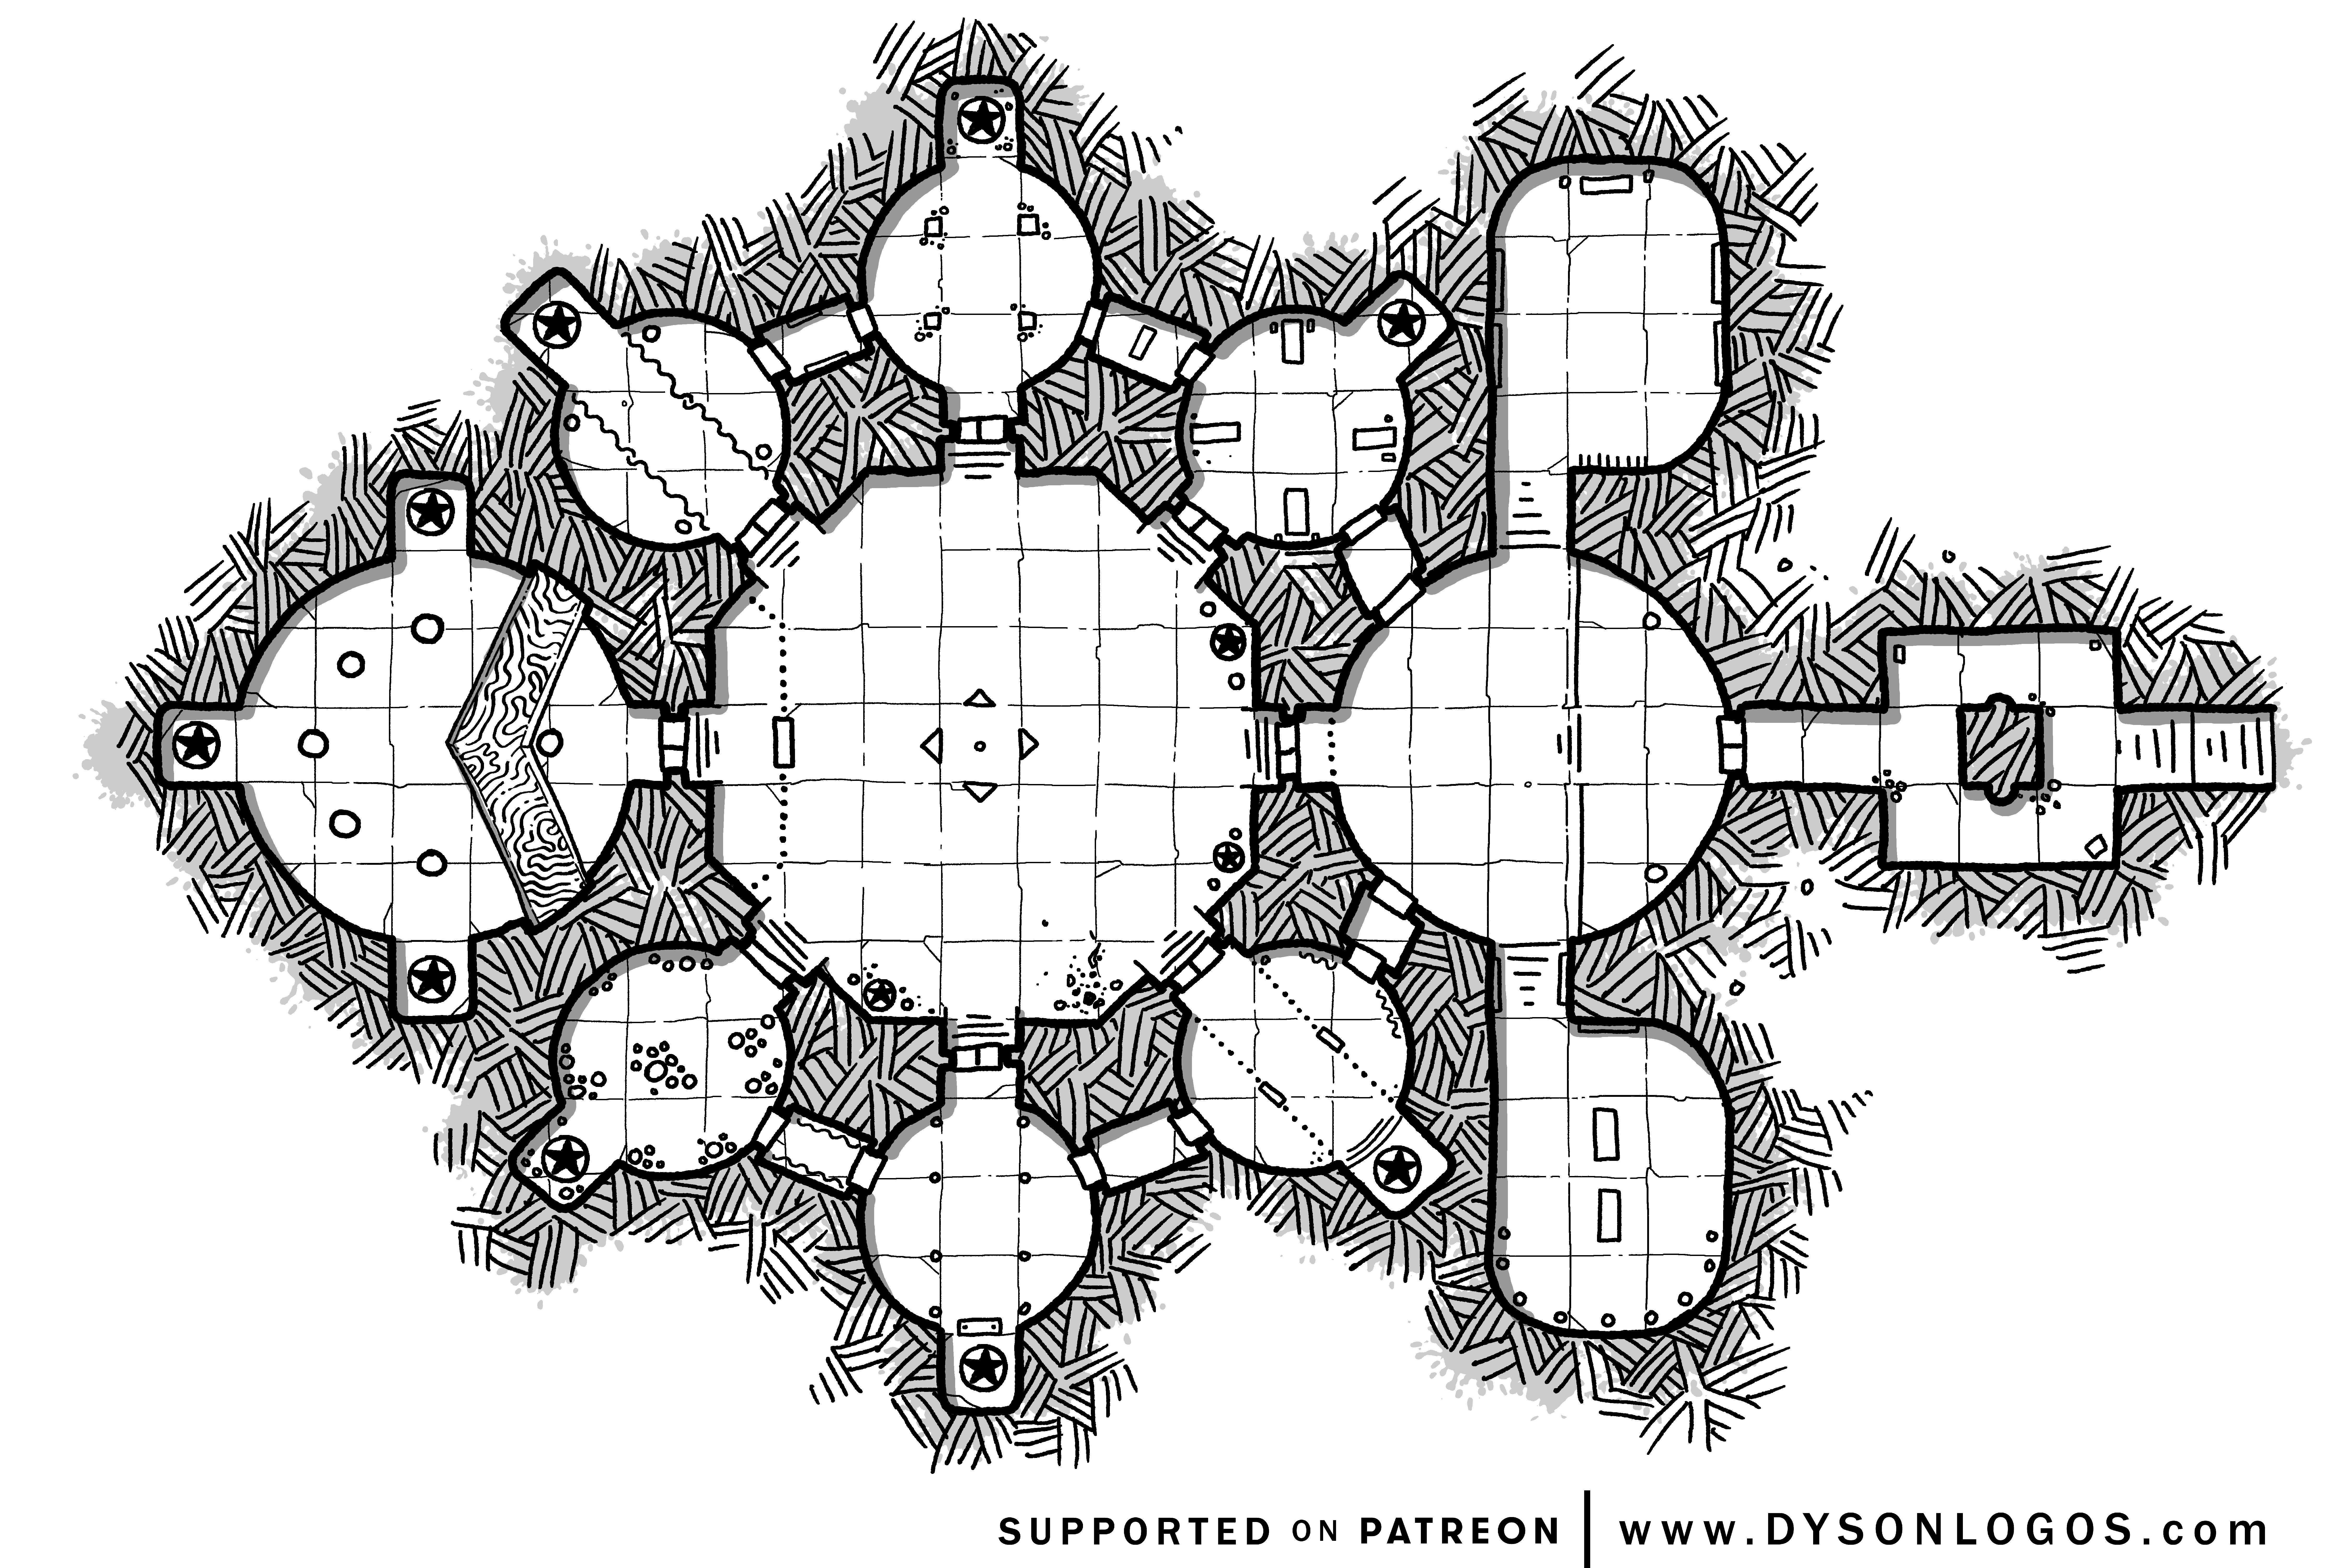 Sanctuary of the Magi (1200 dpi)